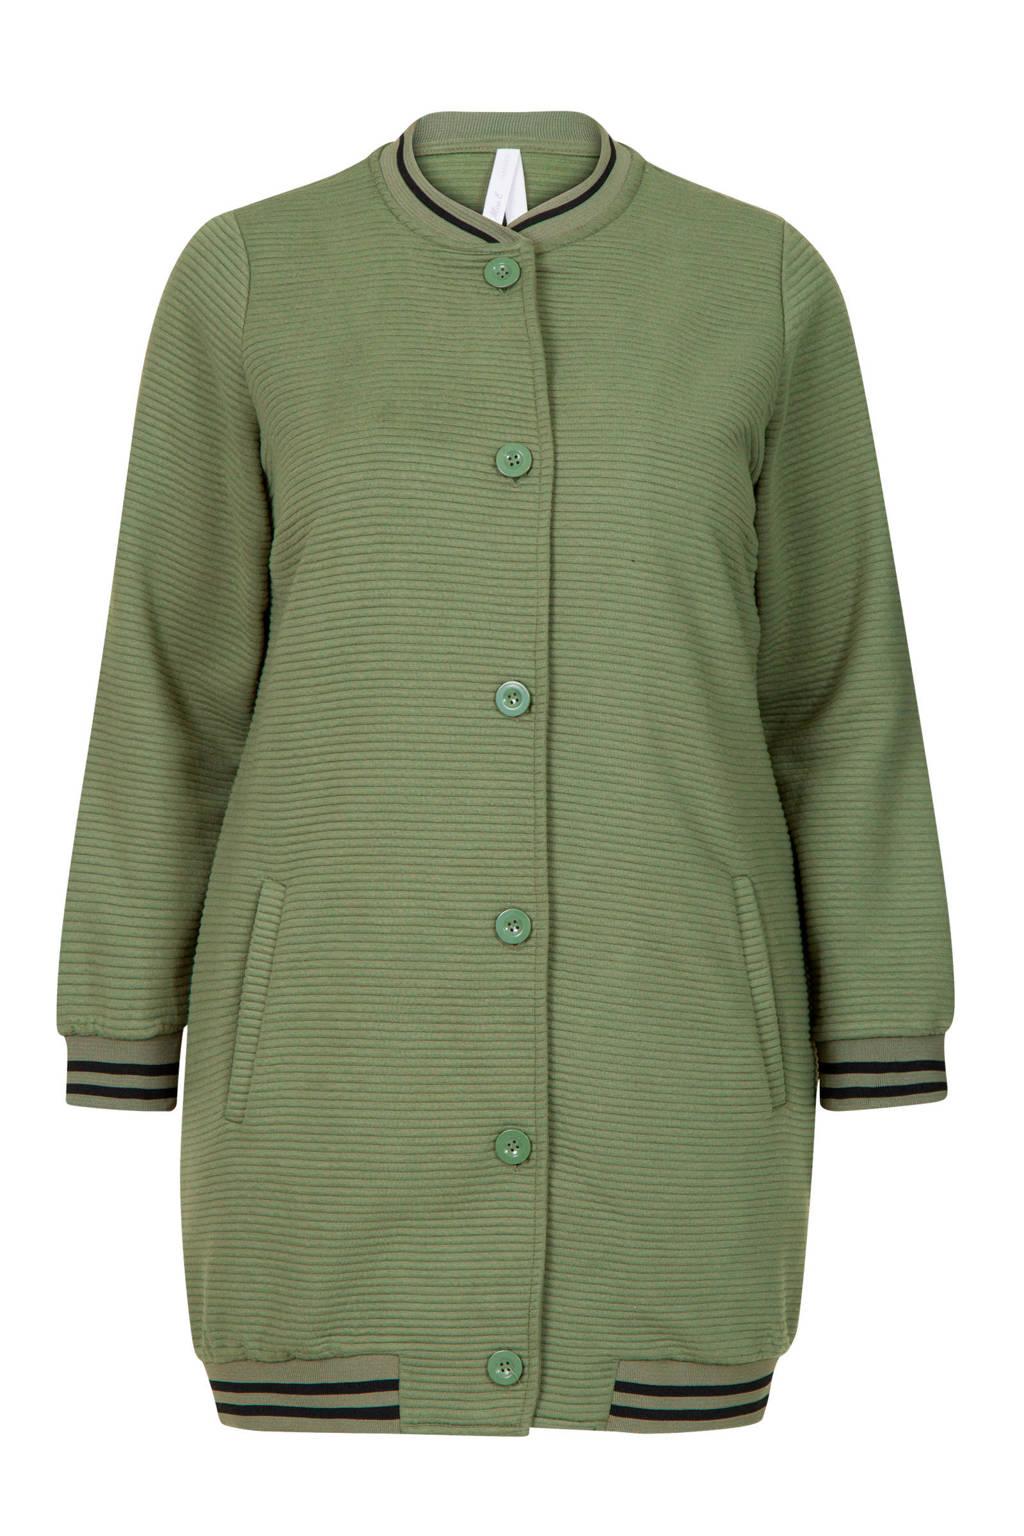 Miss Etam Plus vest groen, Groen